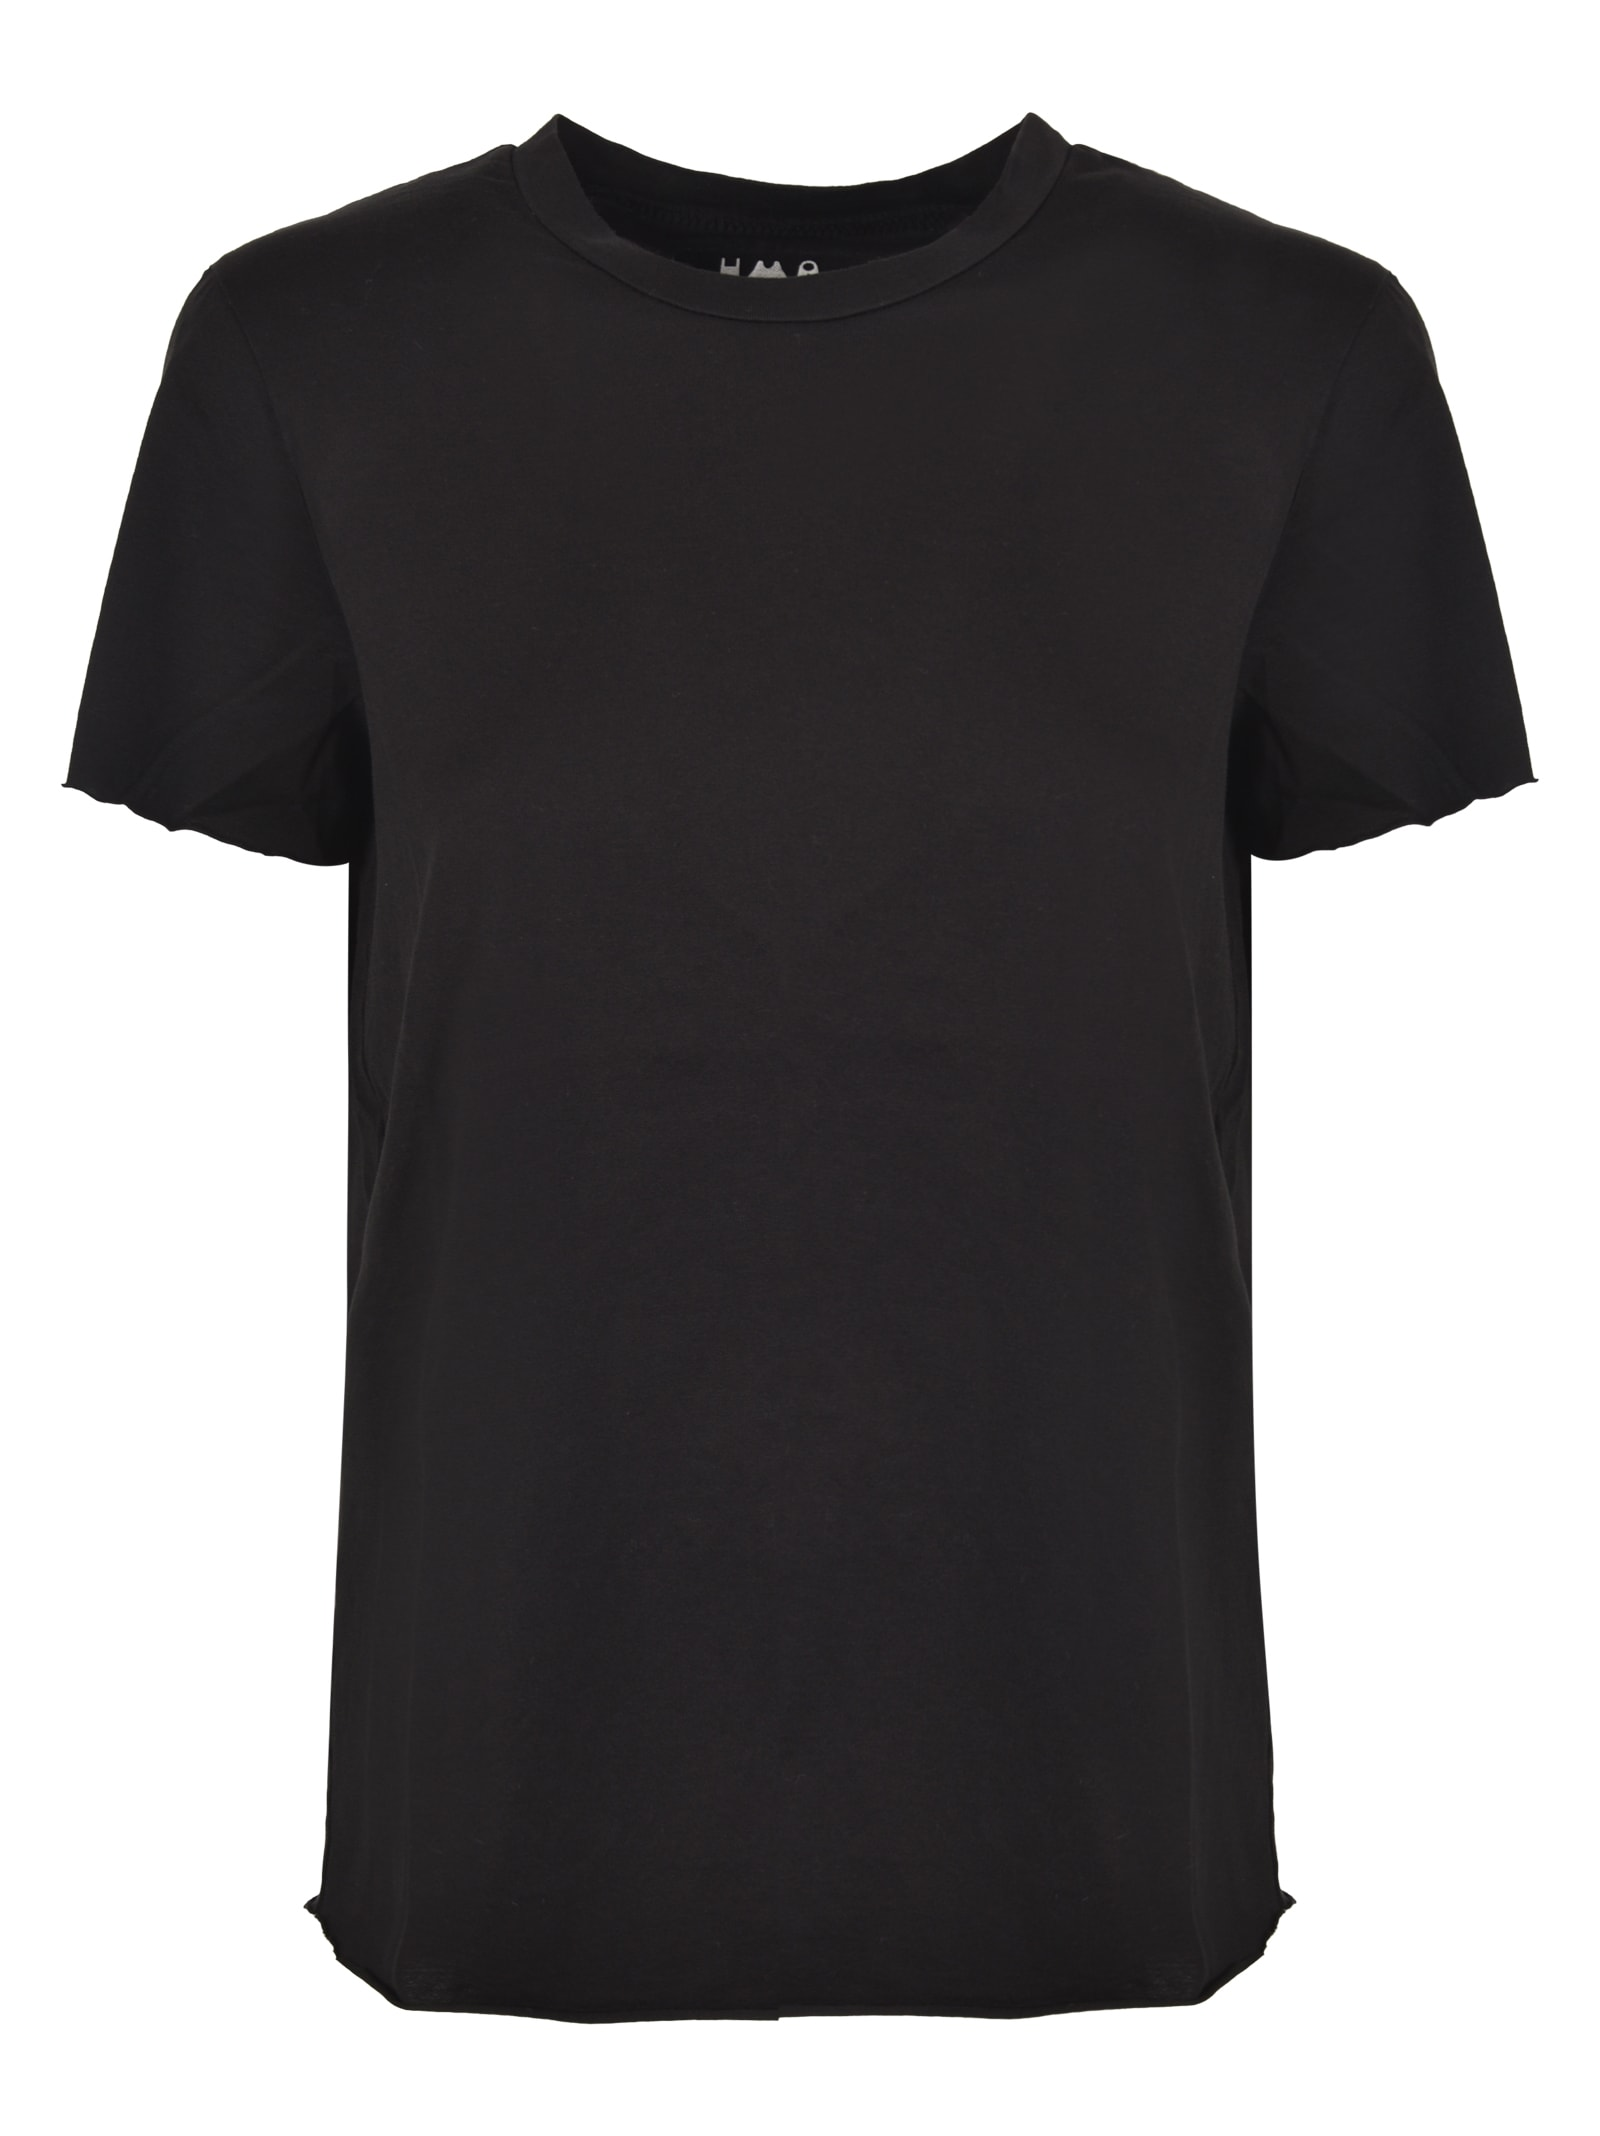 Labo. Art Rico Jap T-shirt